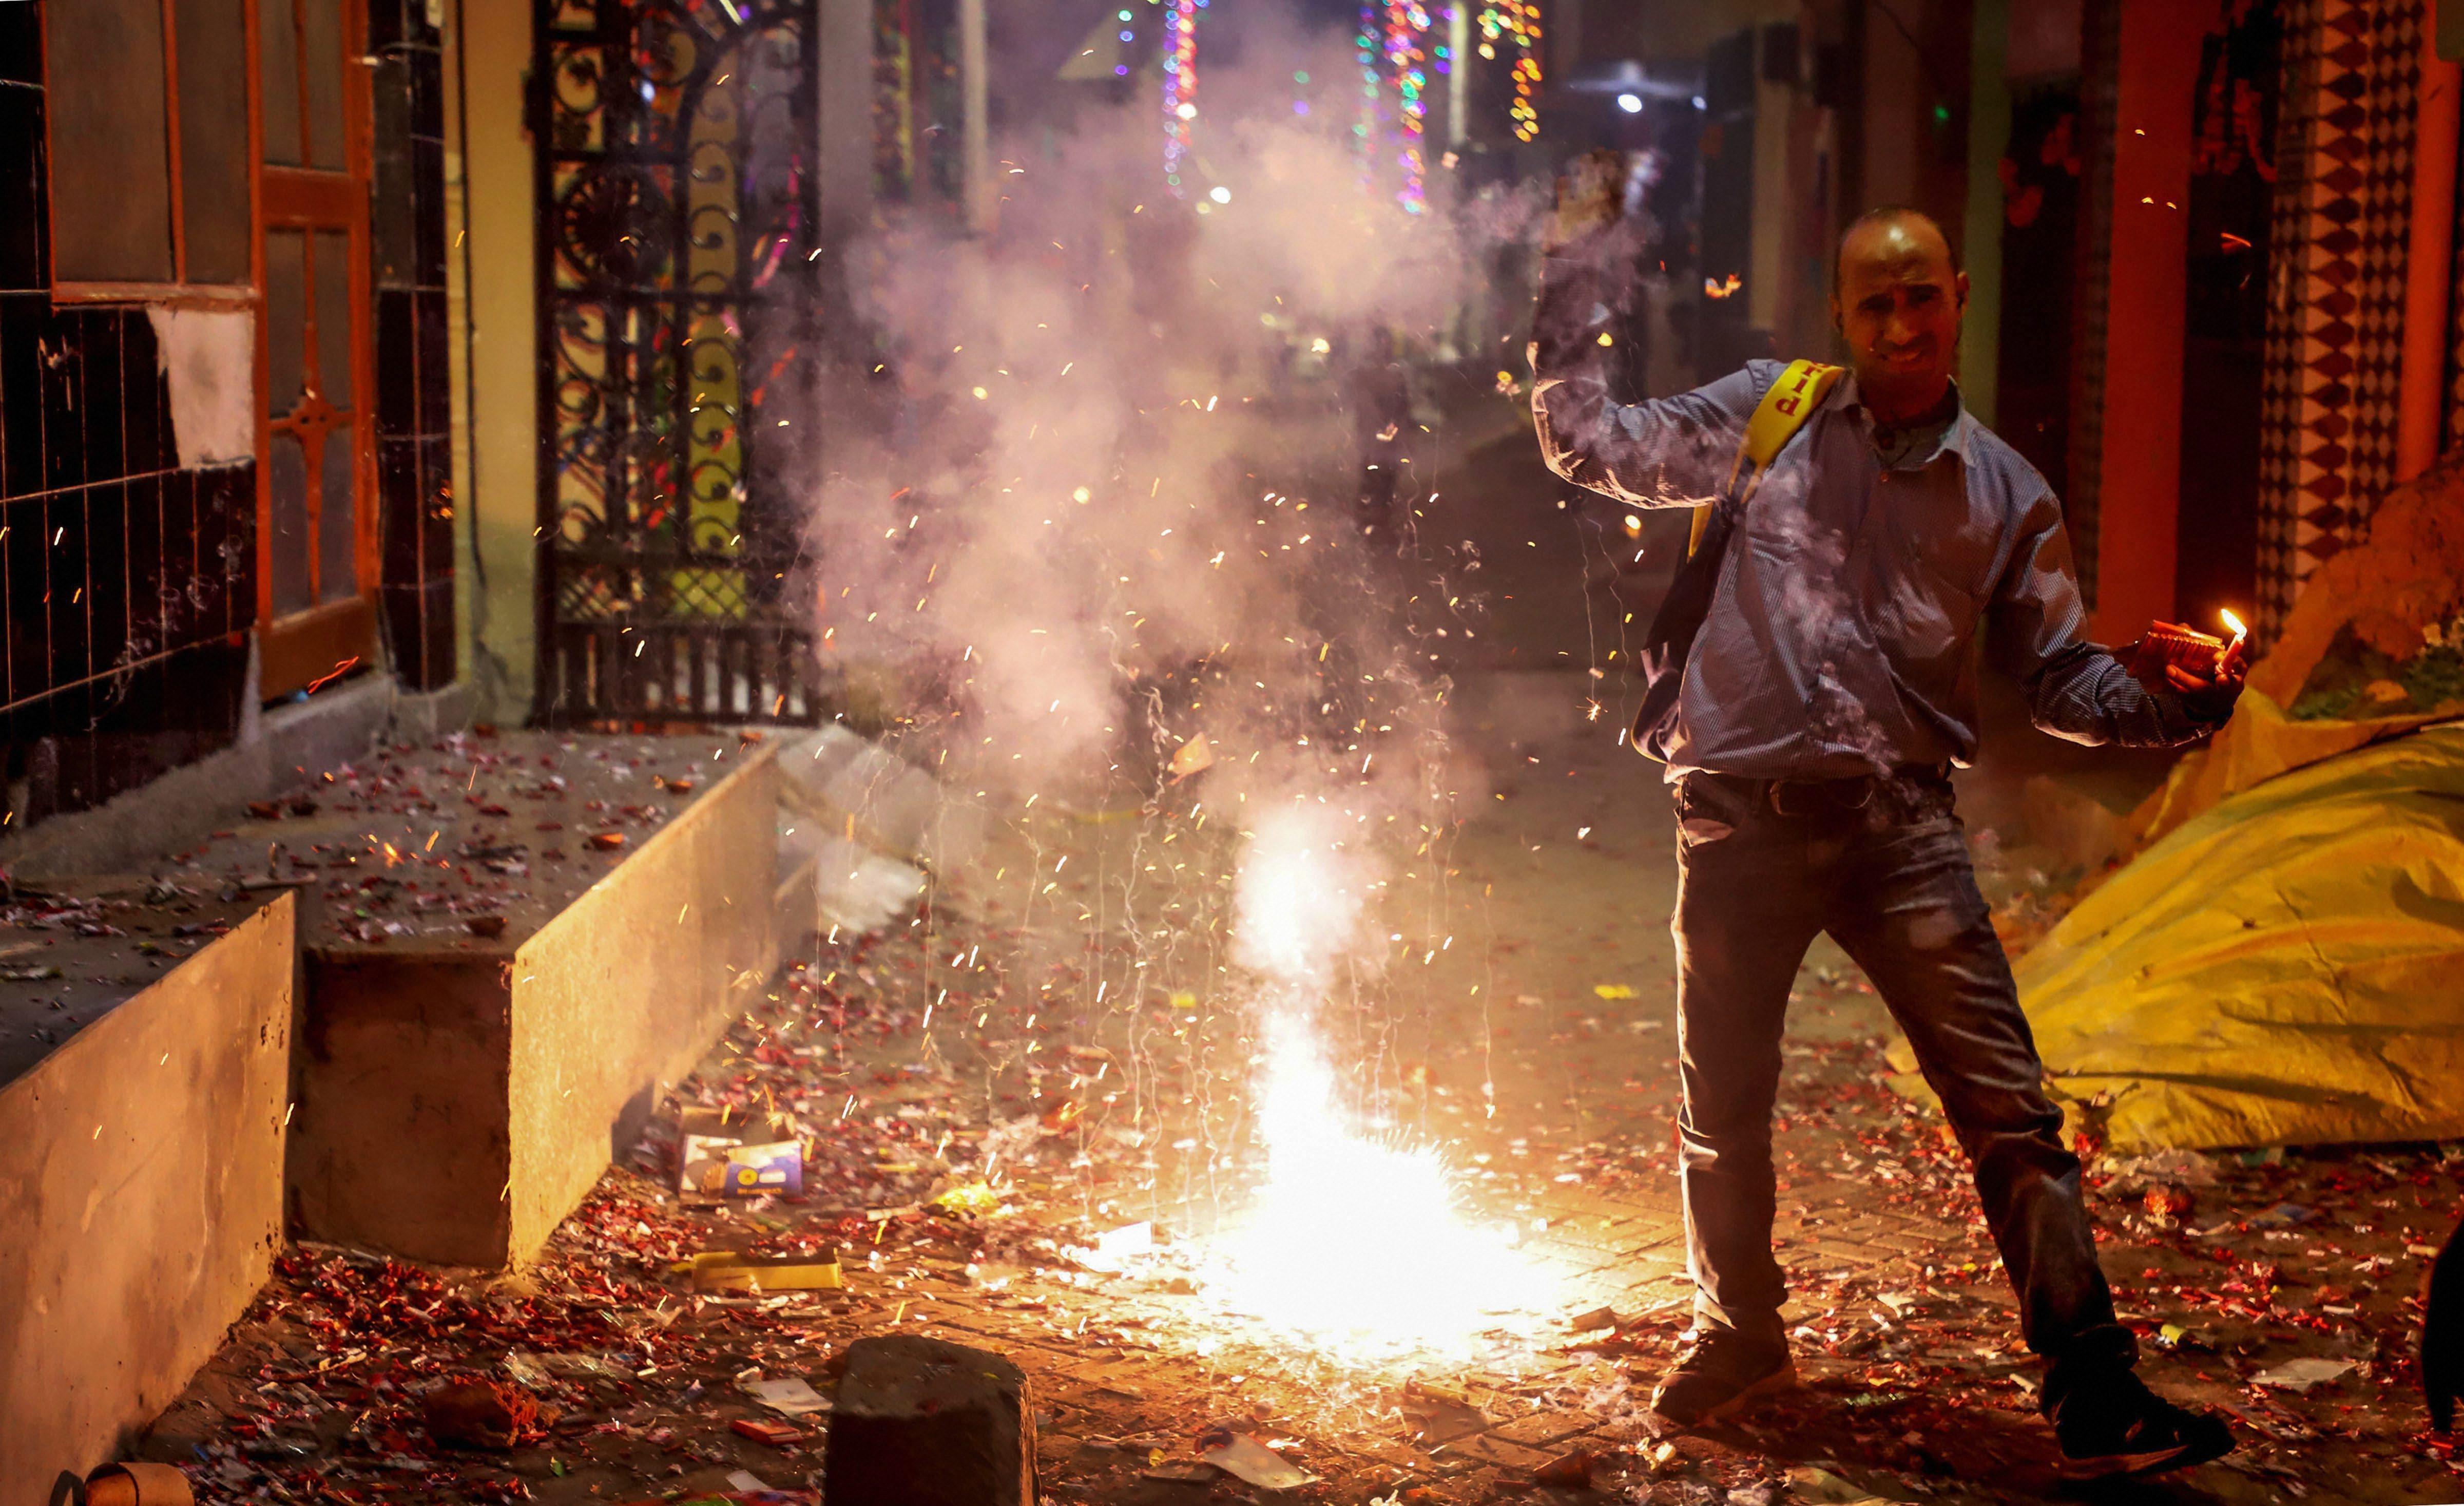 Smoke rises as people burn firecrackers to celebrate Diwali in Gurgaon on Wednesday, November 7.